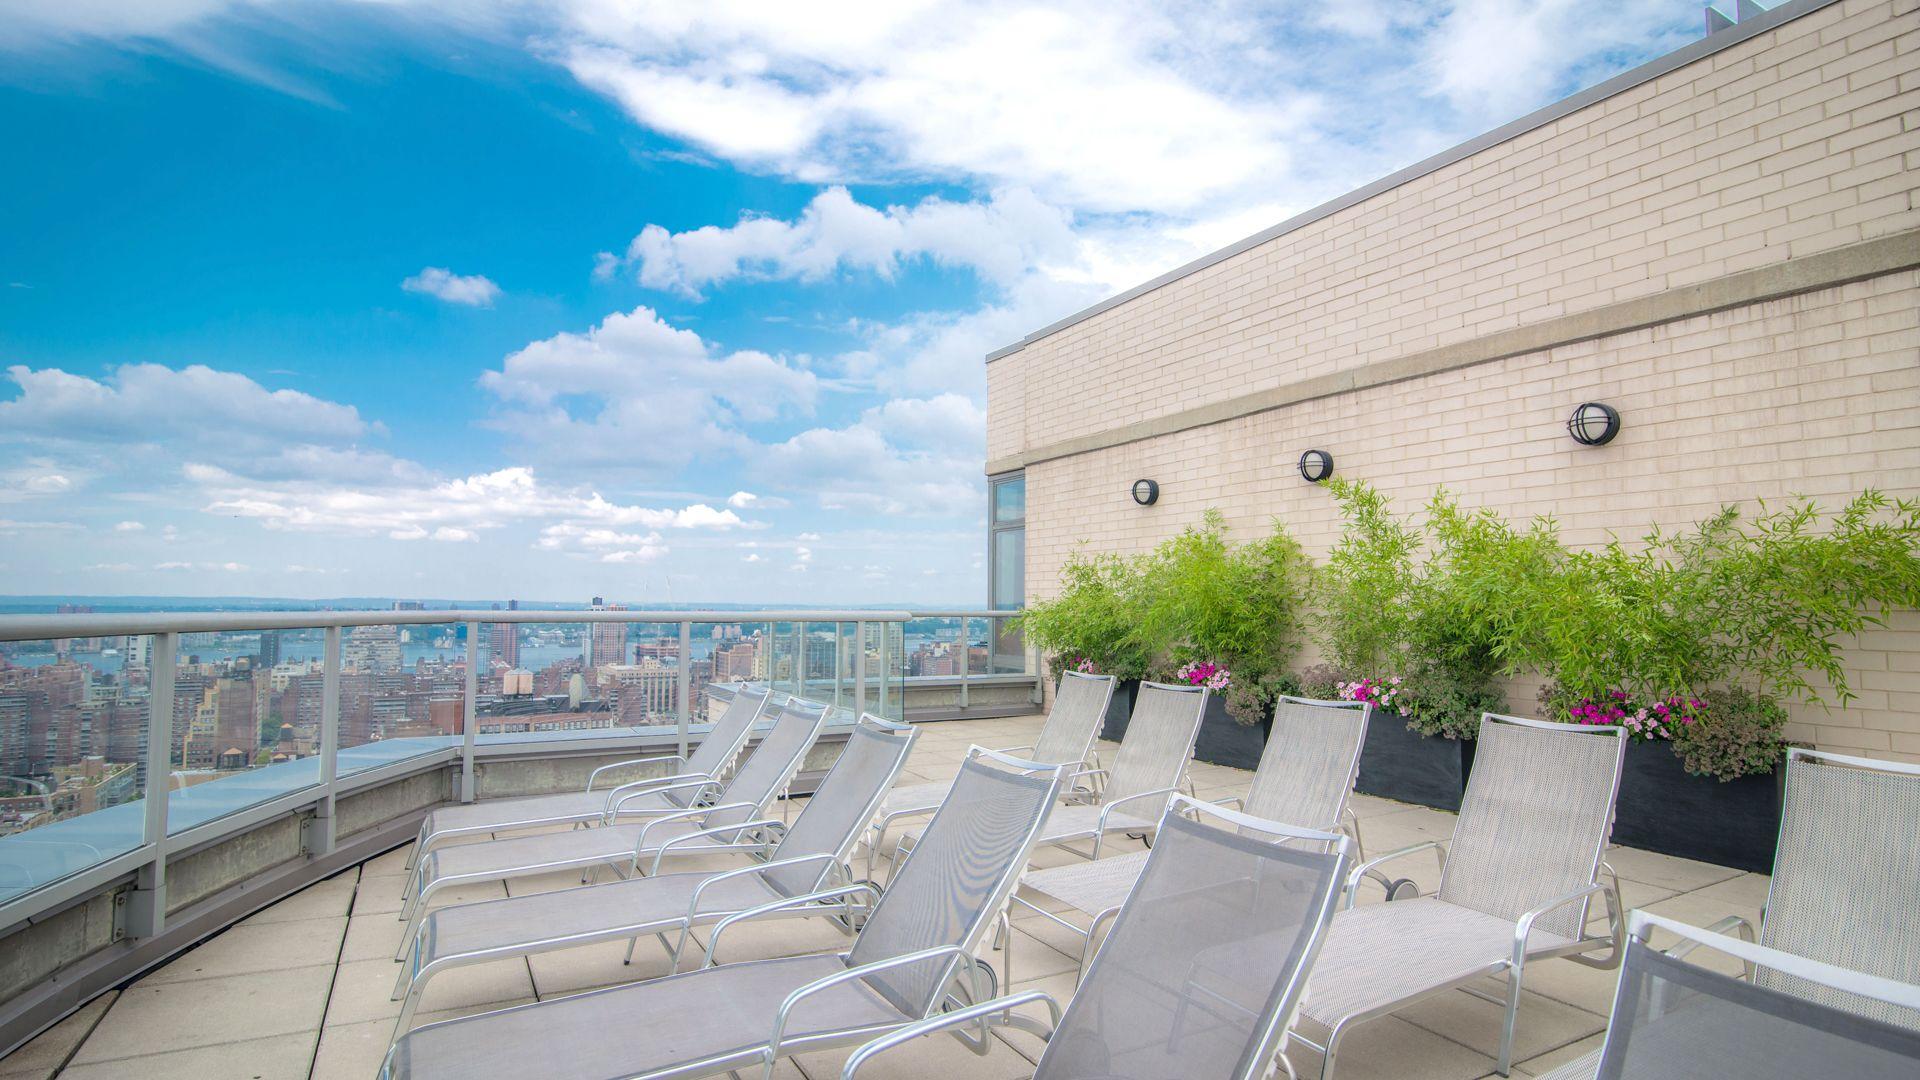 800 Sixth Apartments - Terrace